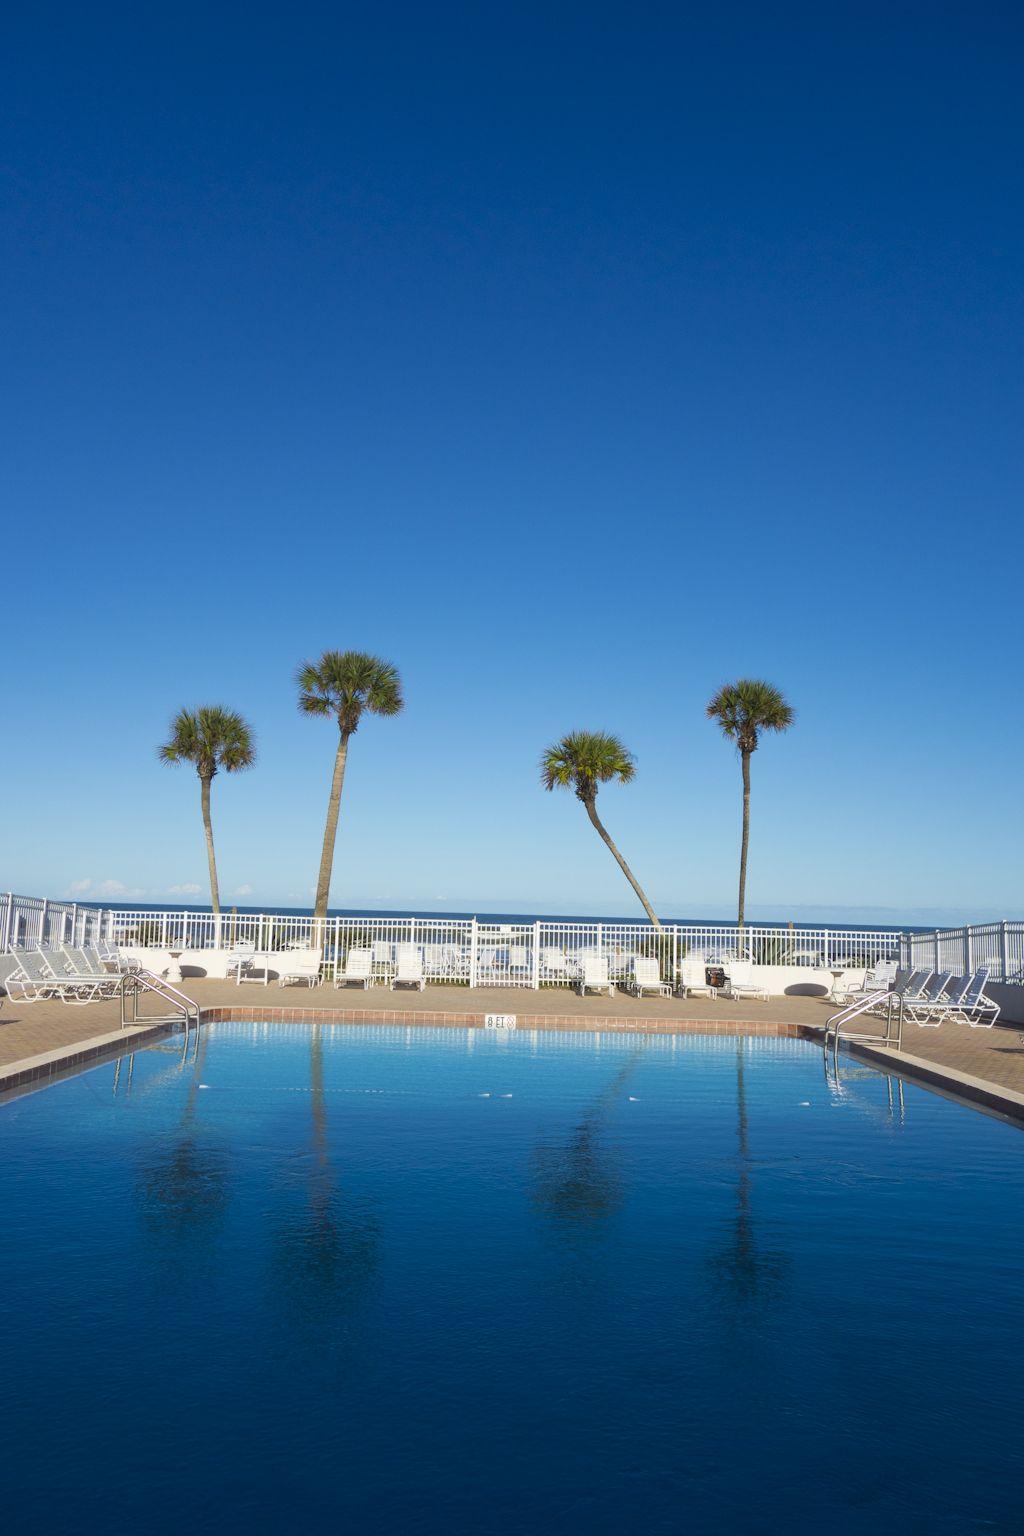 53ca5f60e8b67d6a5751d74303568491 - Sea Coast Gardens New Smyrna Beach Fl